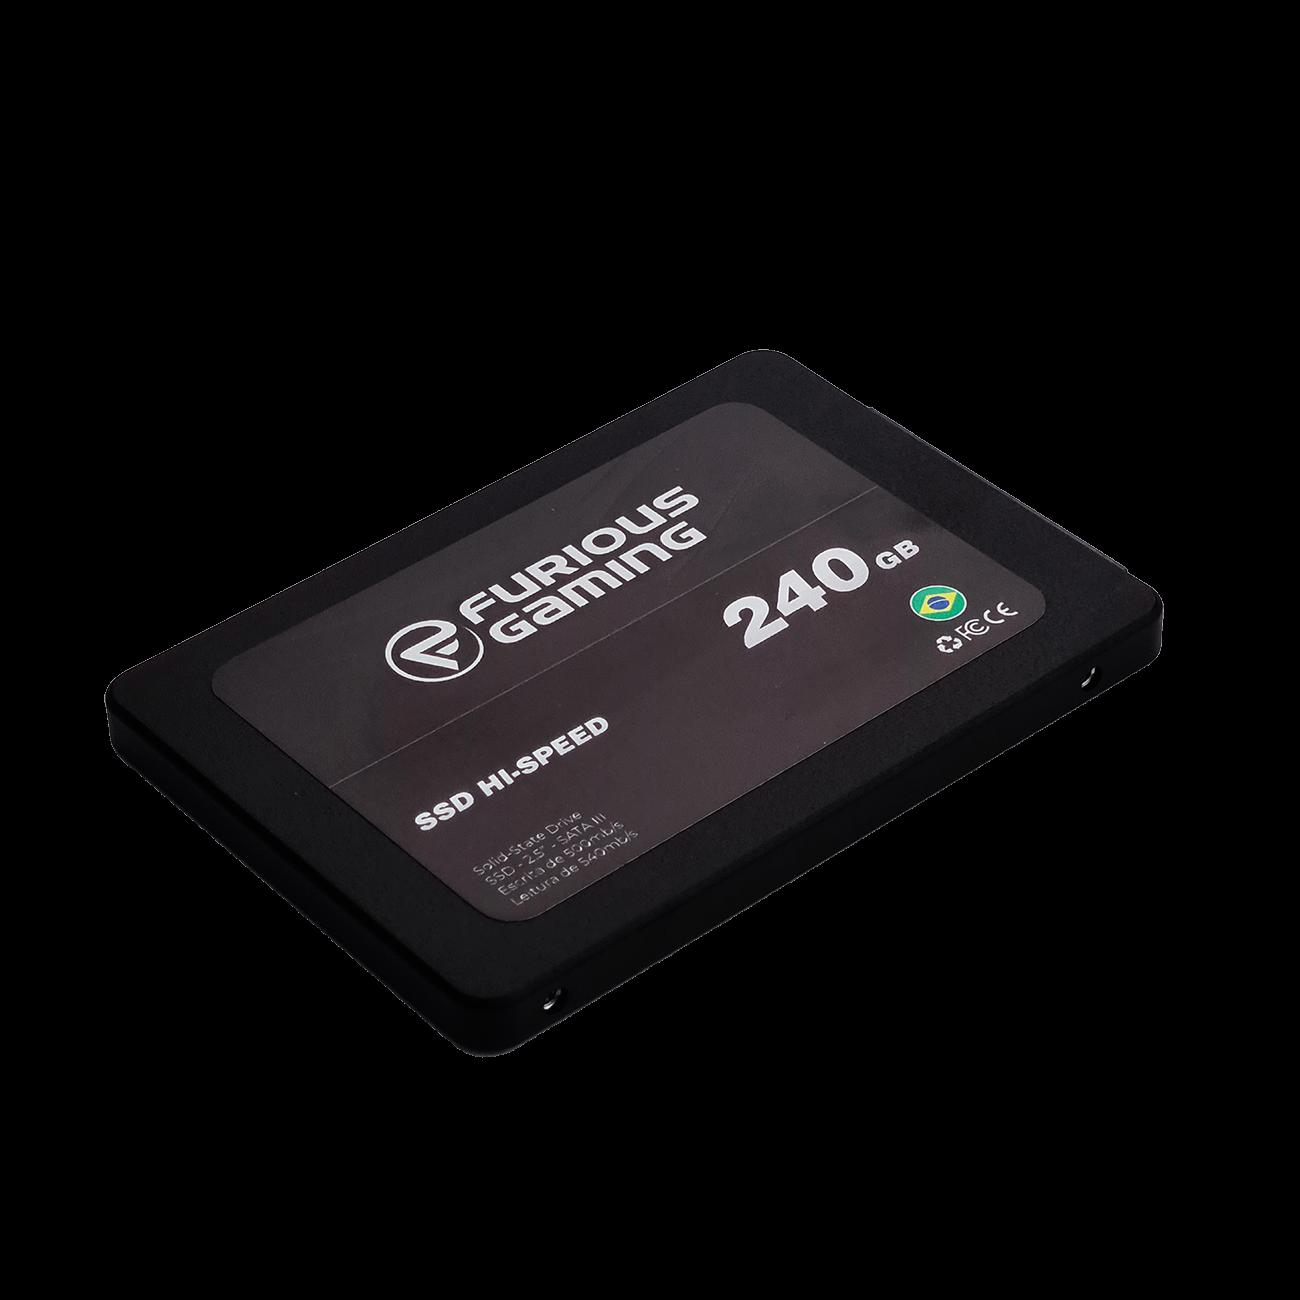 SSD Furious FRGM, 240GB, Sata III, Leitura 540MBs e Gravação 500MBs, FRGM-240-SSD - OEM